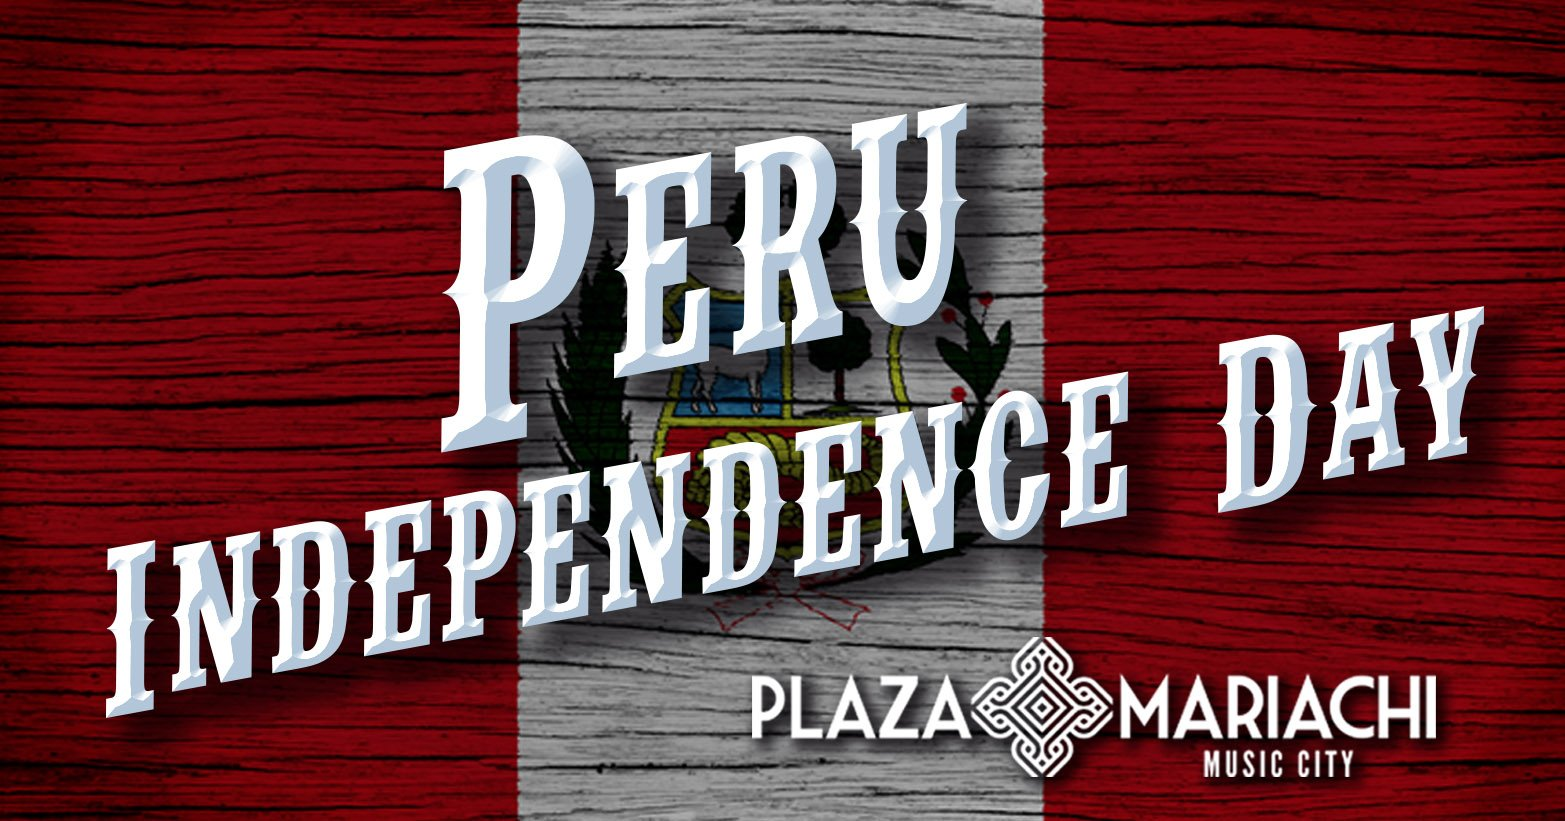 Peruvian Independence Day Celebration Plaza Mariachi